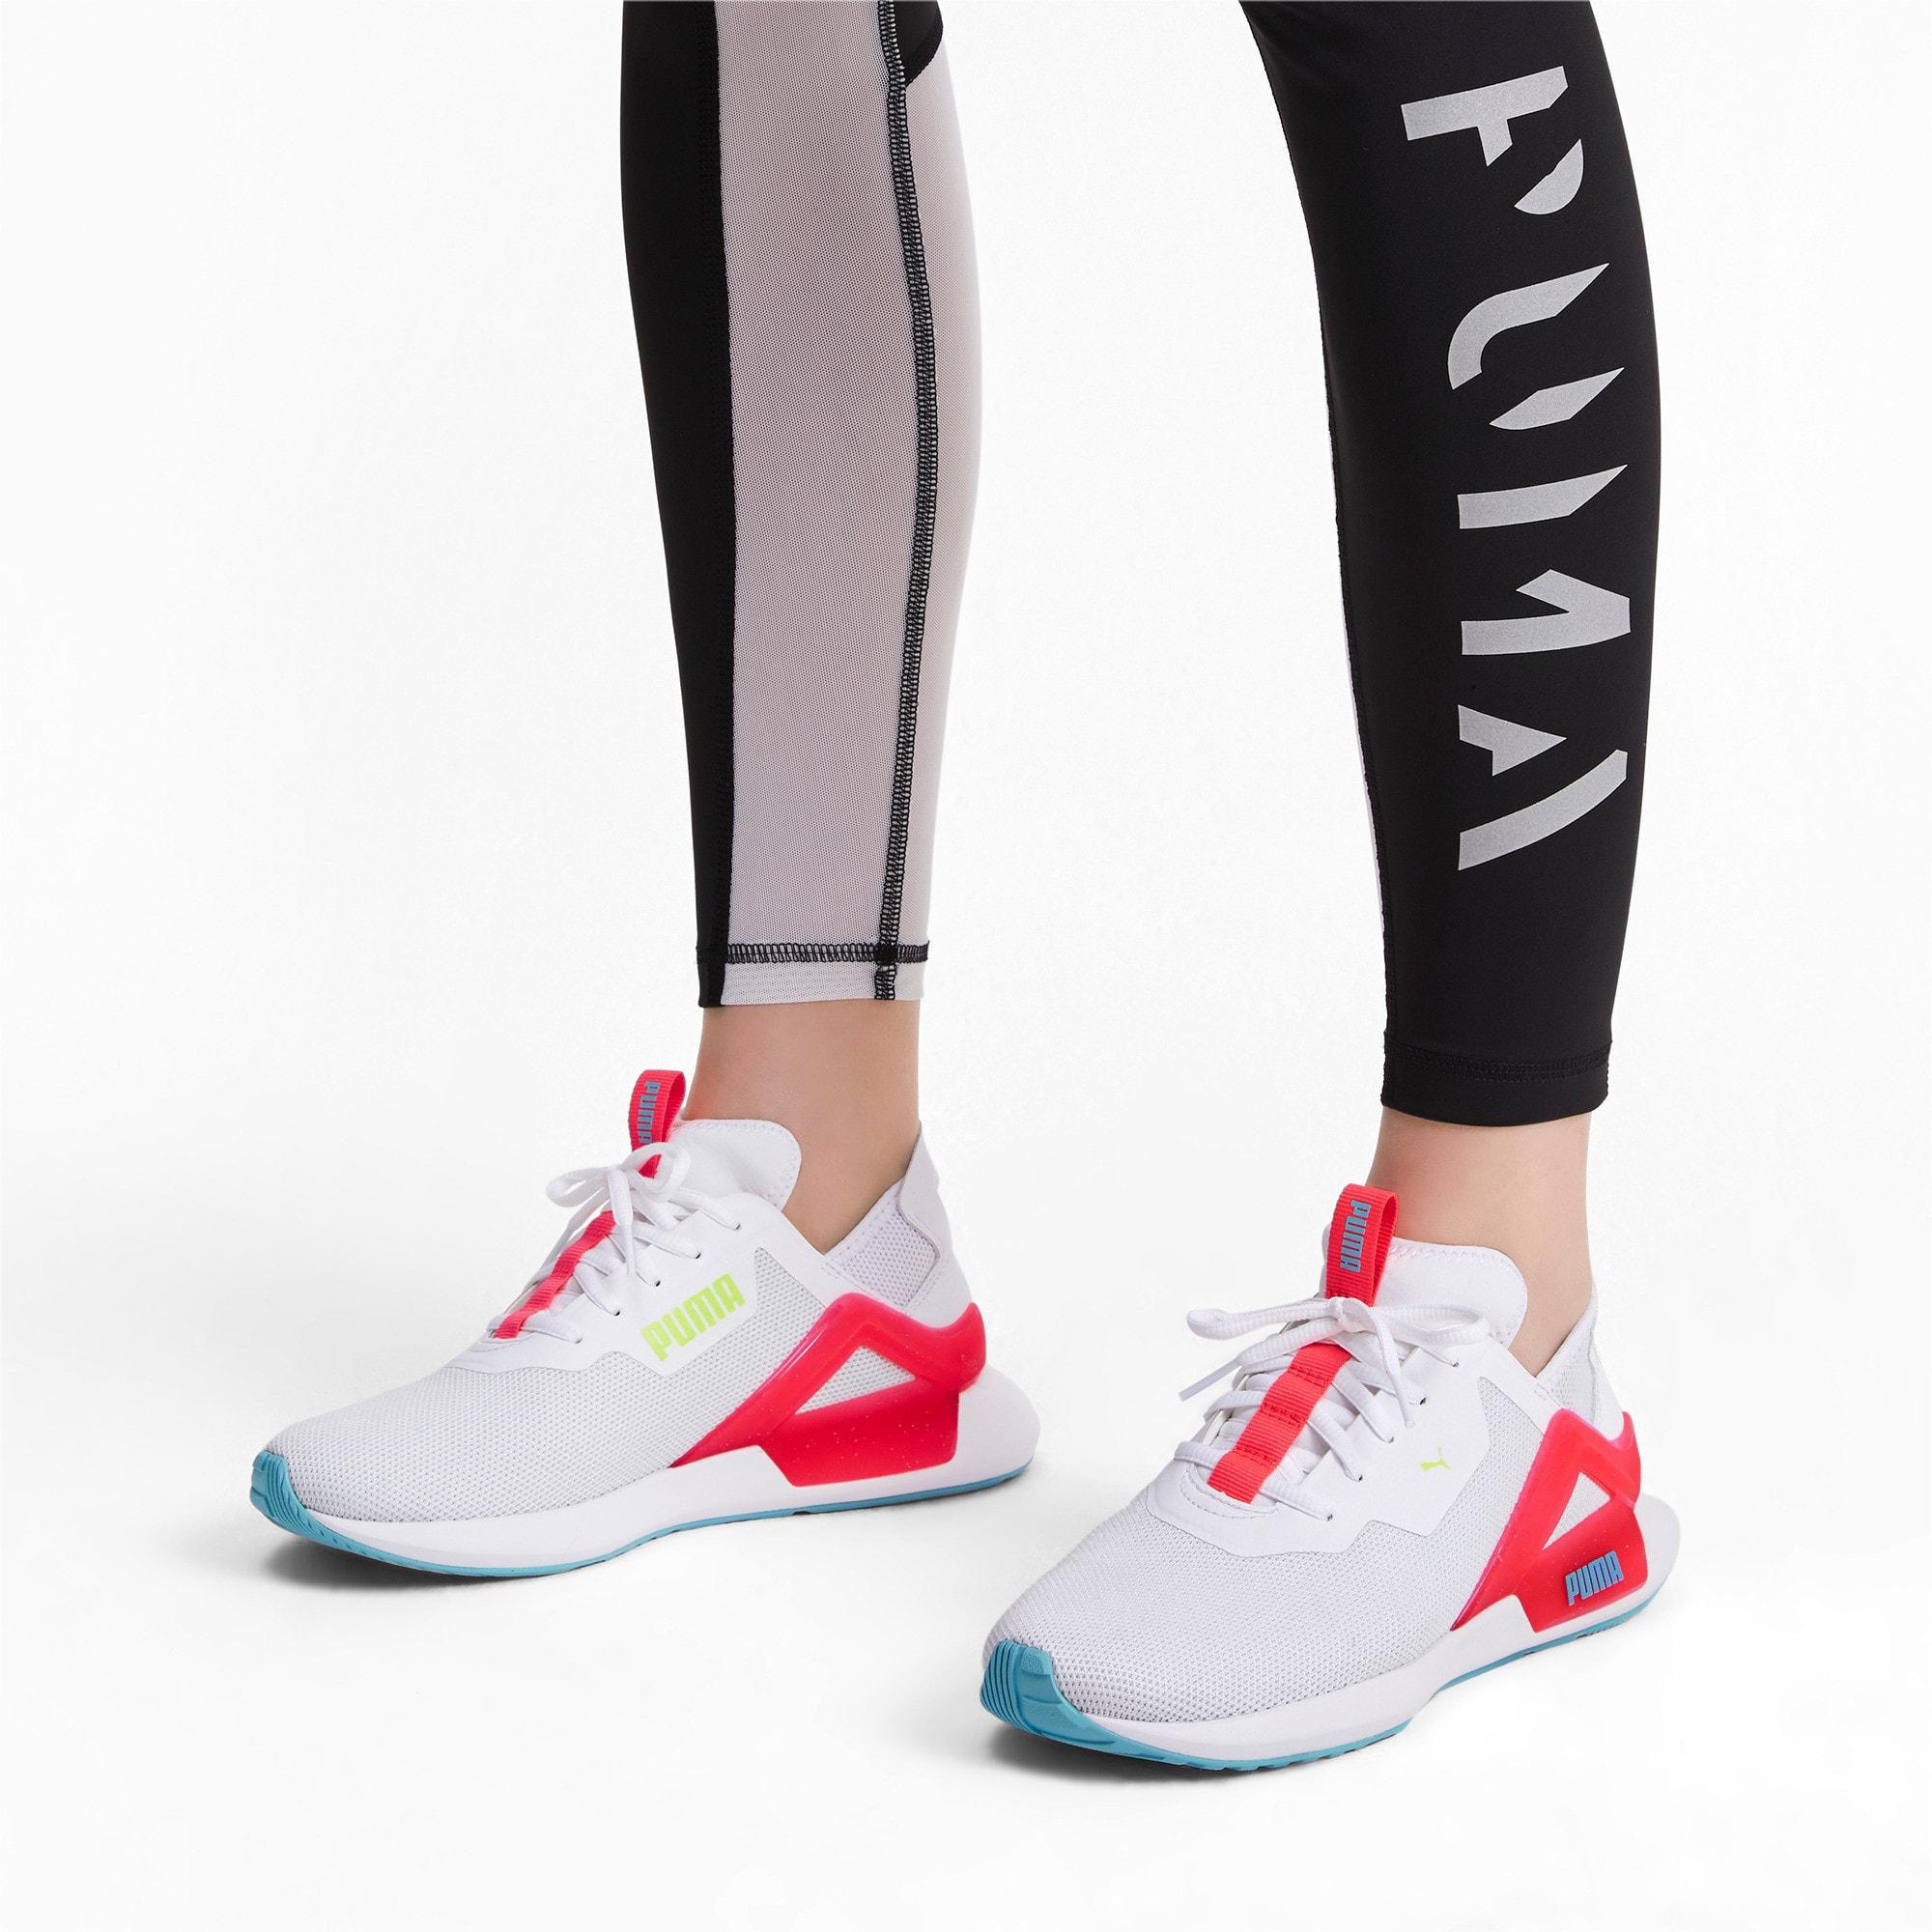 Thumbnail 2 of Rogue X Knit Women's Running Shoes, Puma White-Pink Alert, medium-IND